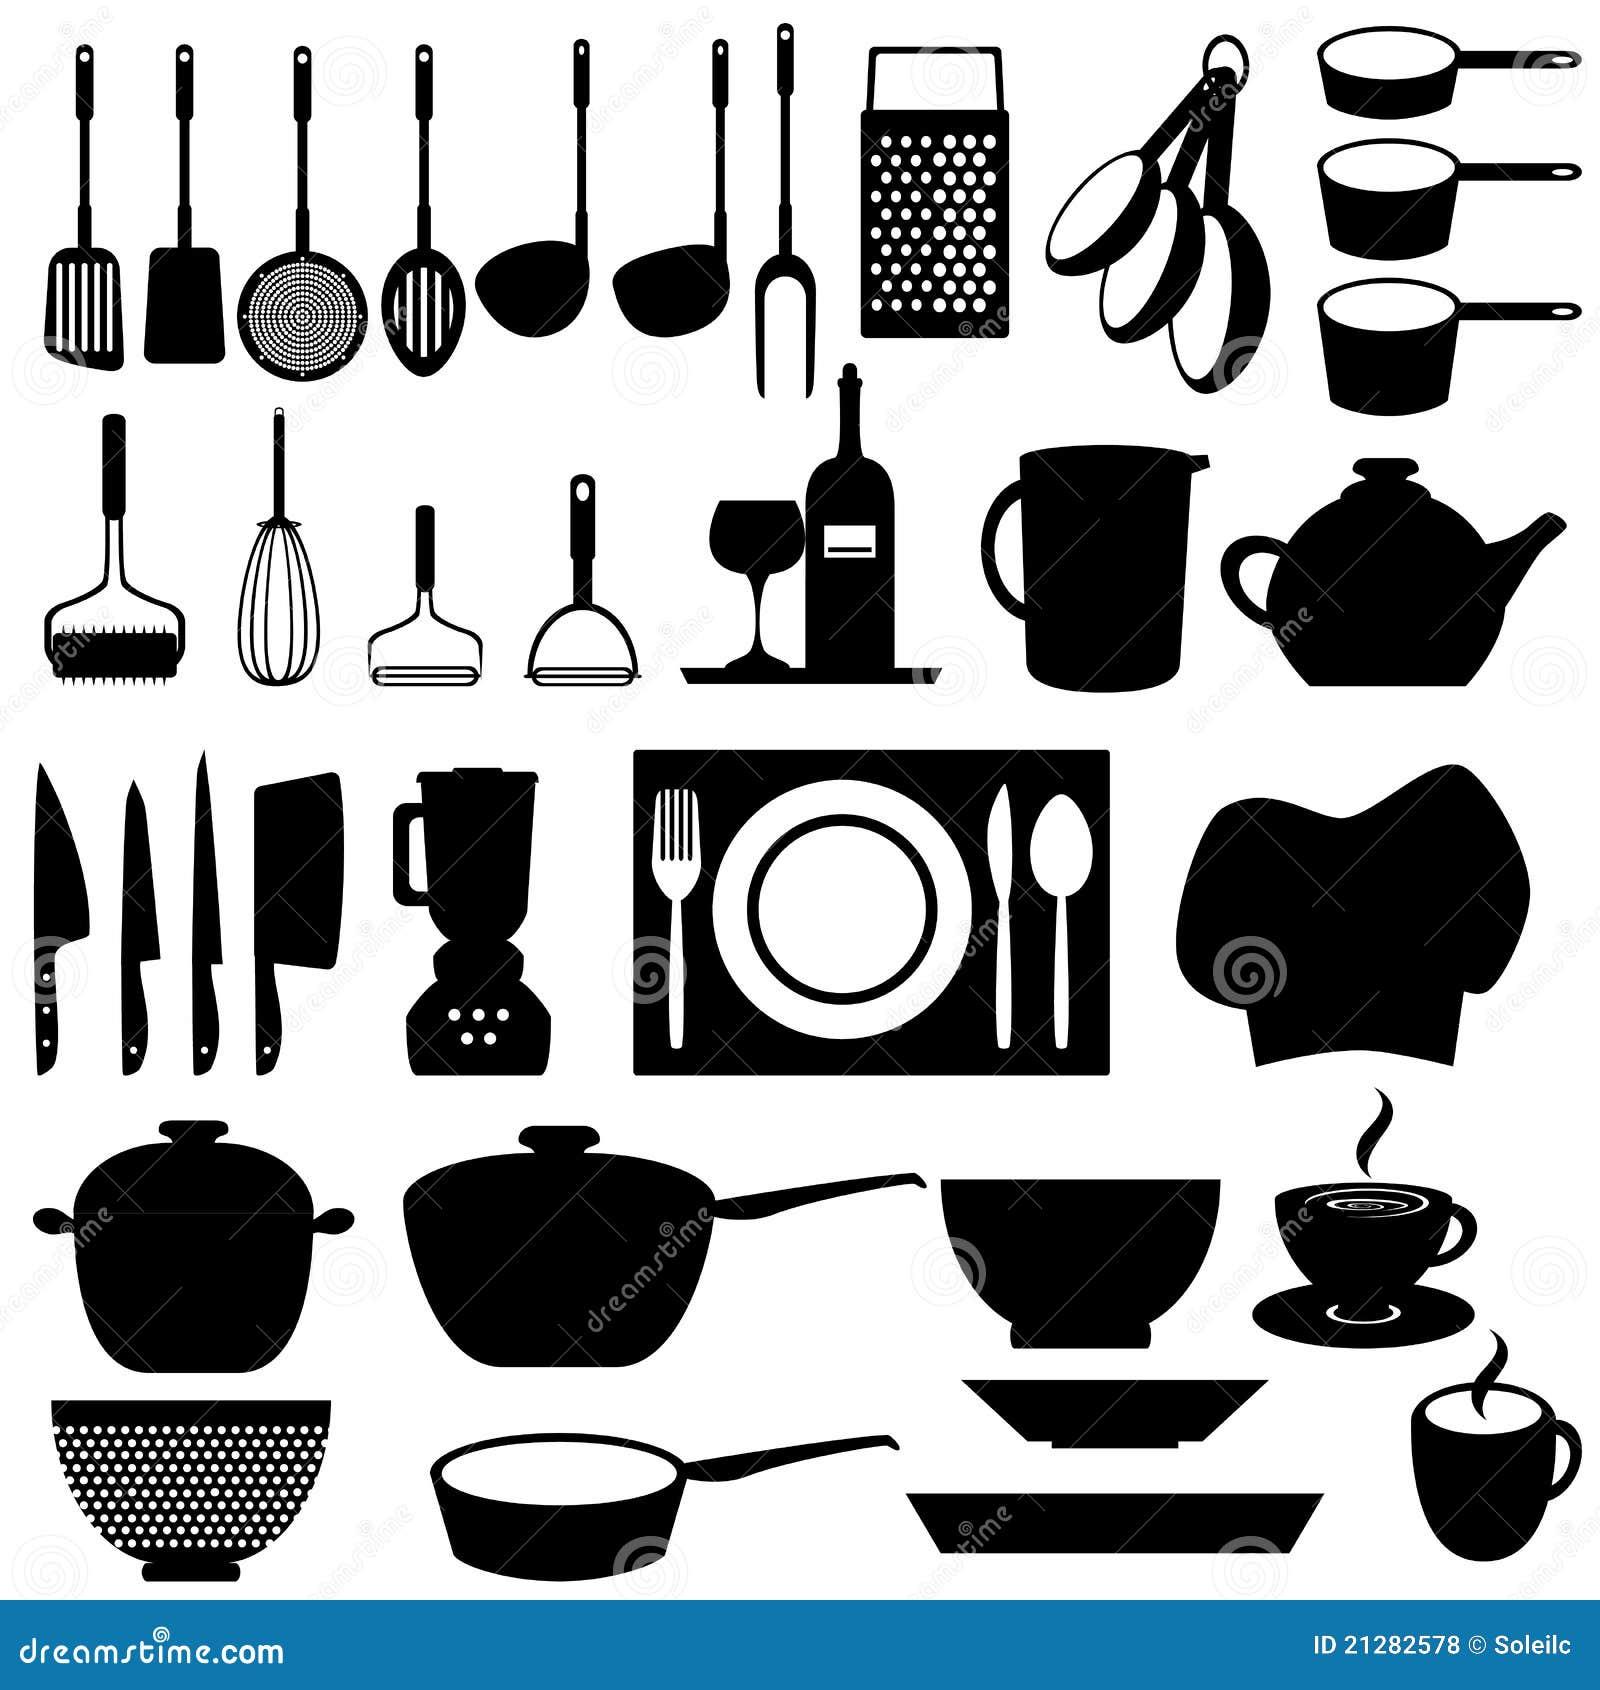 Dream Kitchen Utensils: Kitchen Utensils And Tools Royalty Free Stock Photos